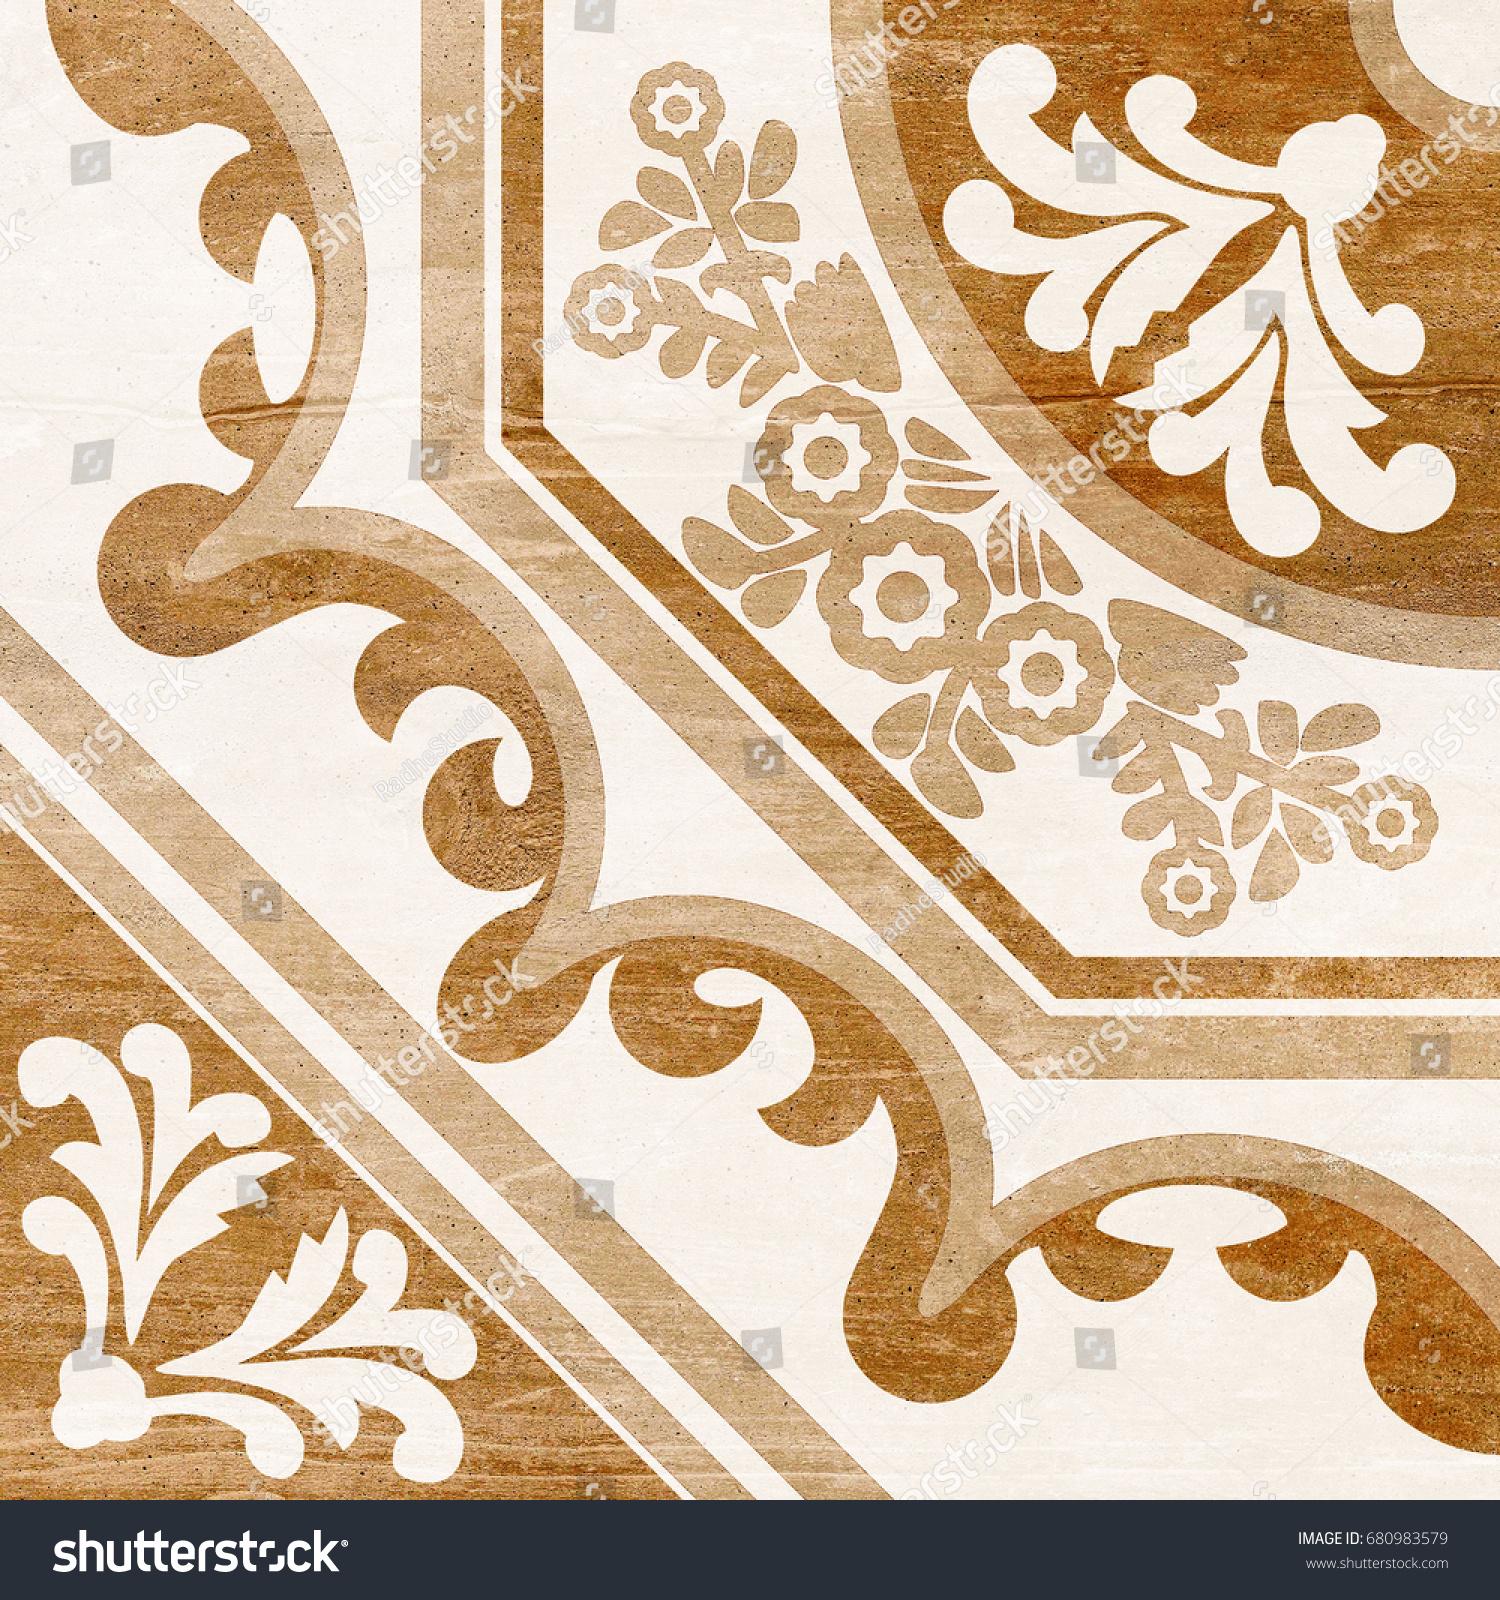 Marble floor tiles pattern stock illustration 680983579 shutterstock marble floor tiles pattern dailygadgetfo Choice Image